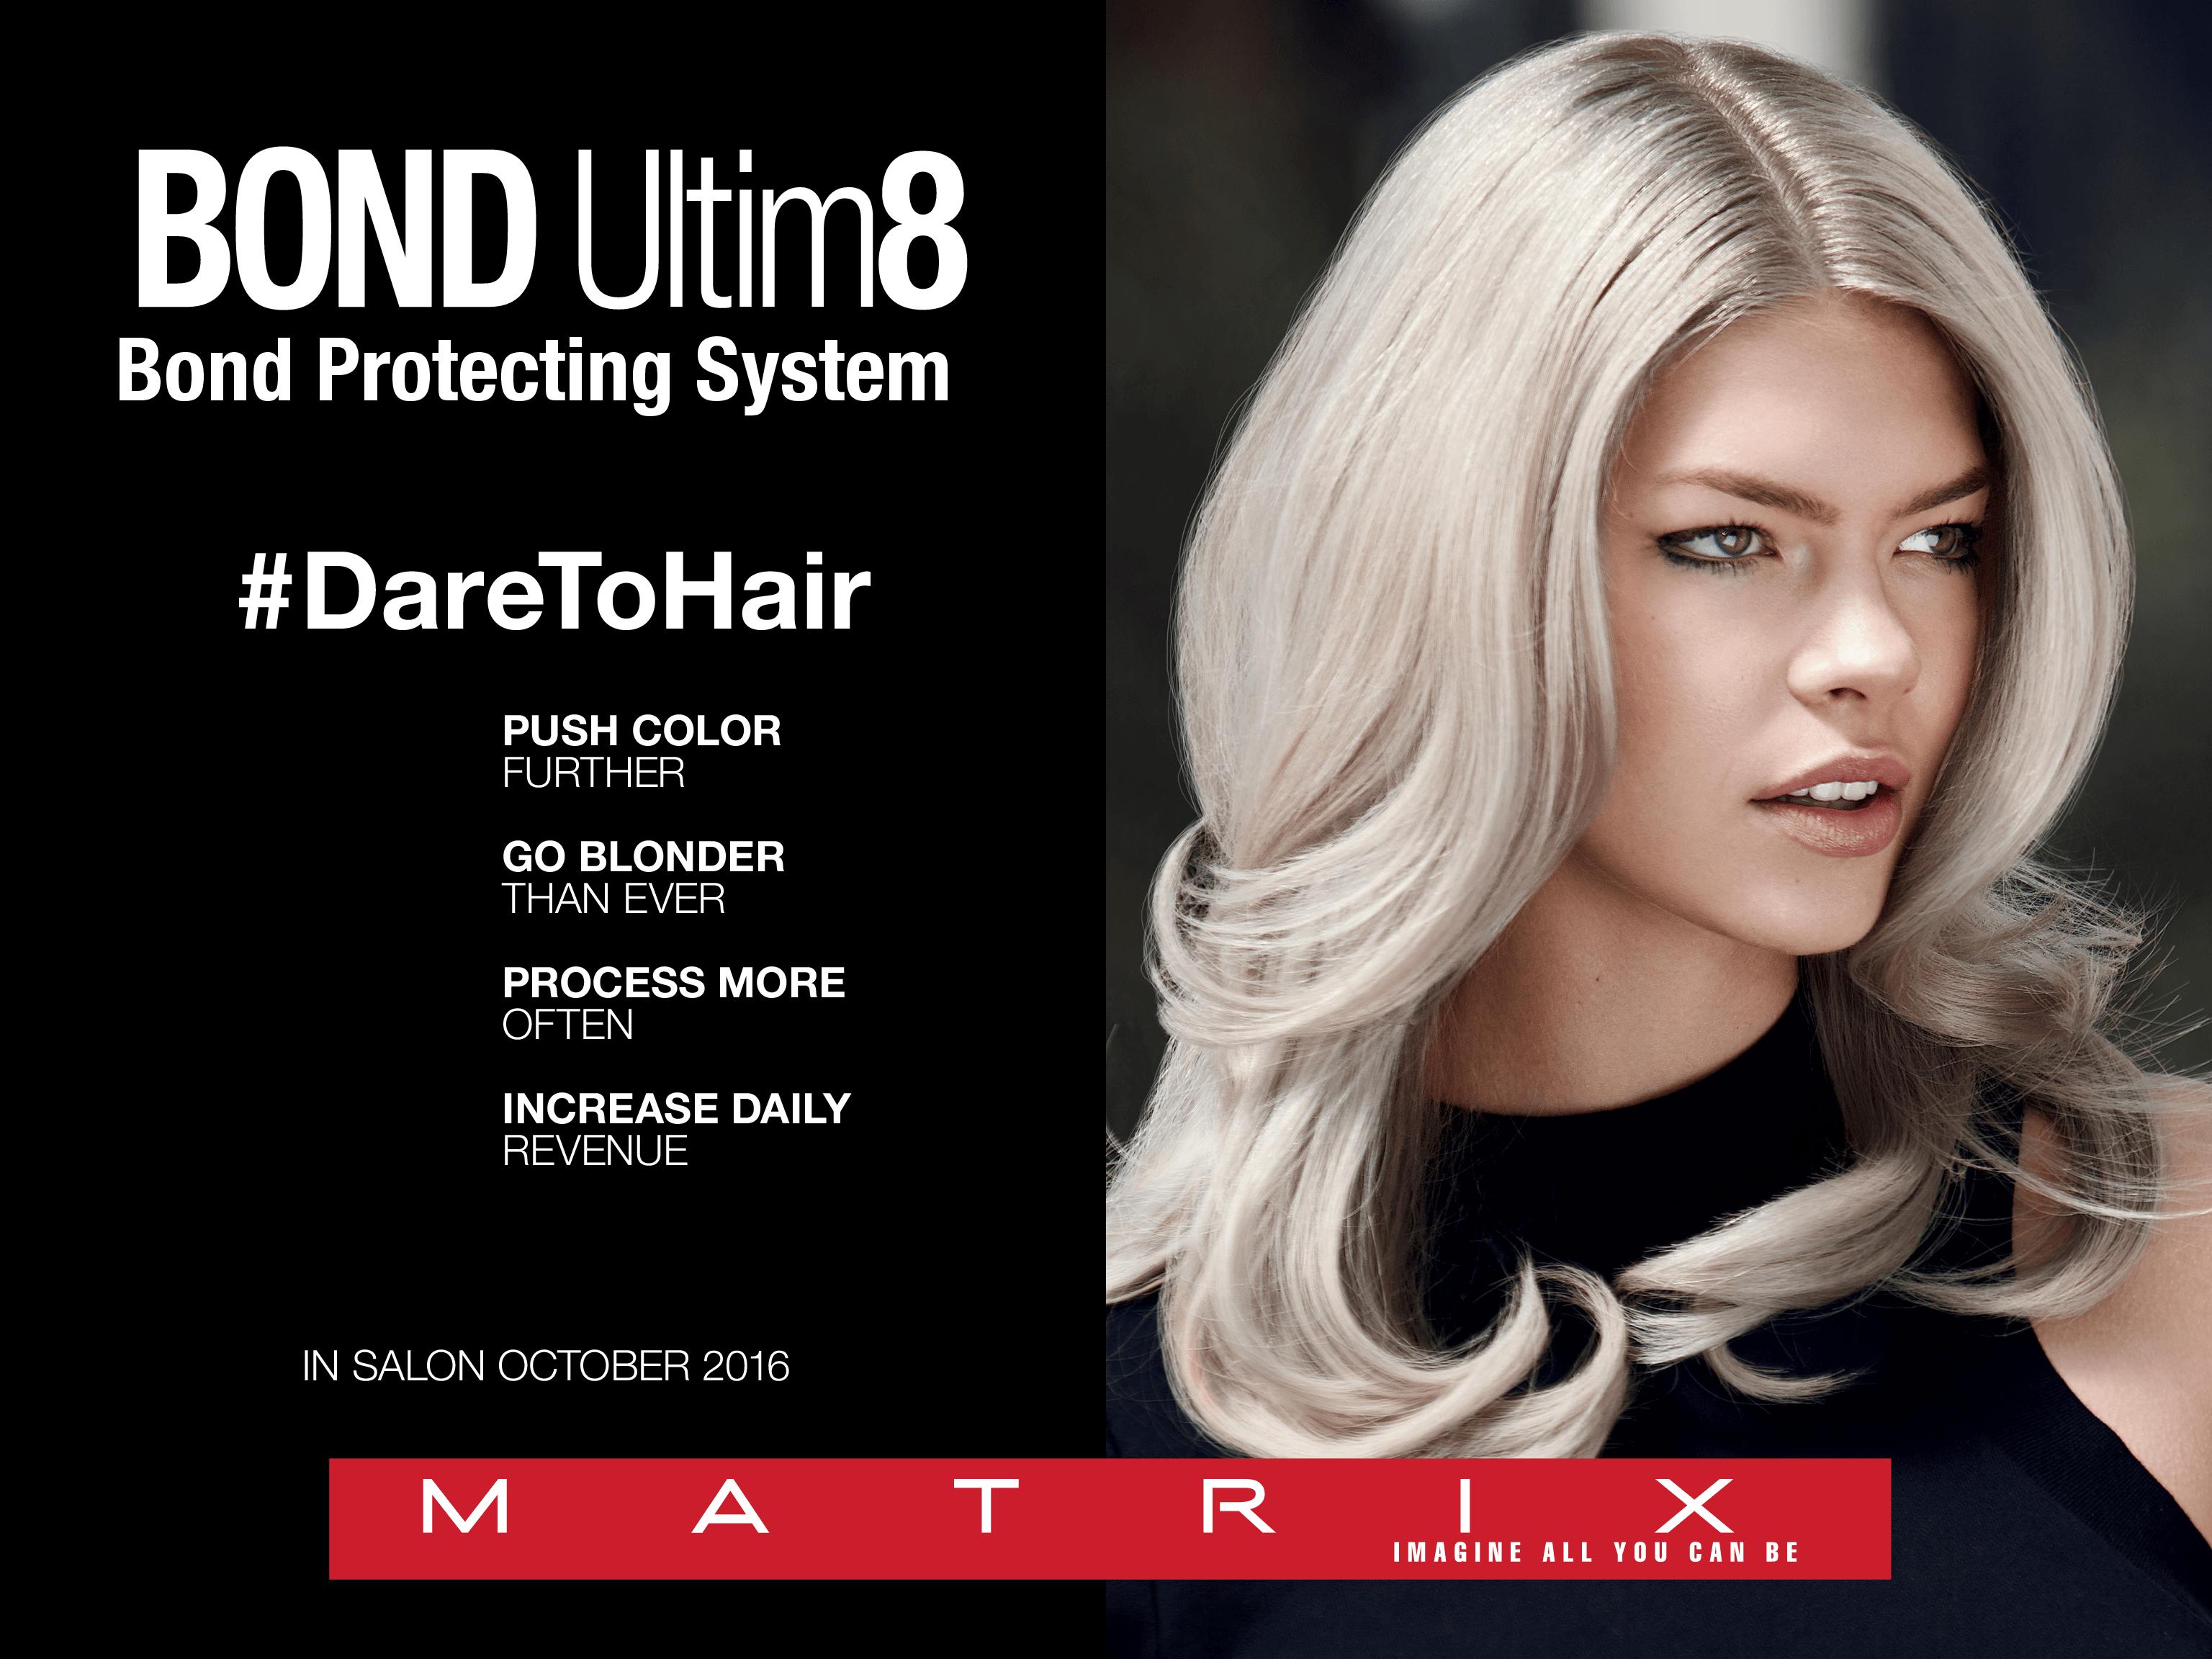 Matrix hair brush 4 - Introducing Bond Ultim8 Matrix Bond Ultim8